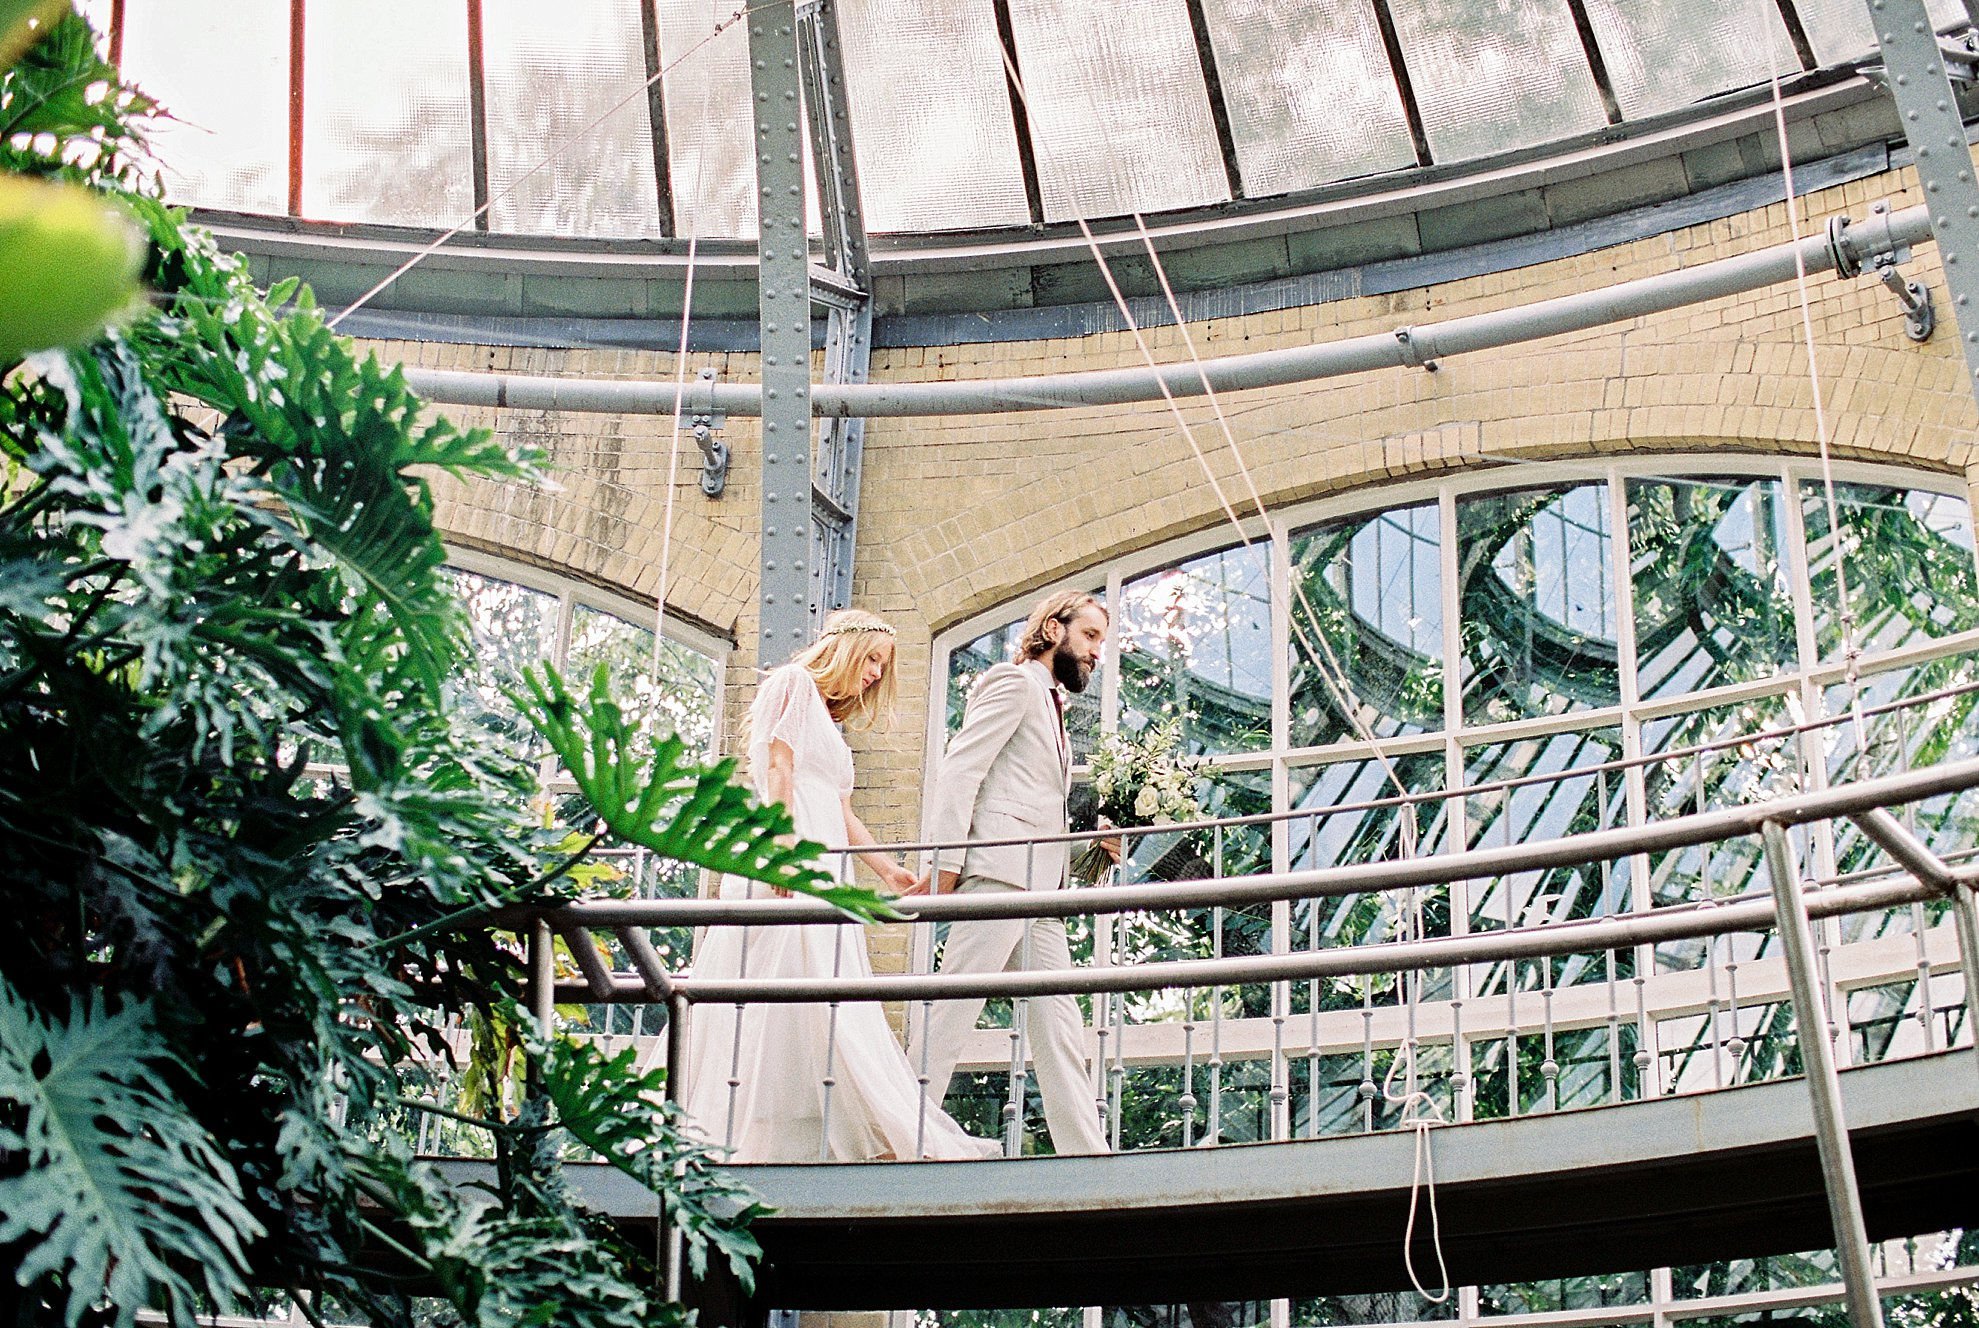 Amanda-Drost-photography-Hortus-Amsterdam-wedding_0014.jpg